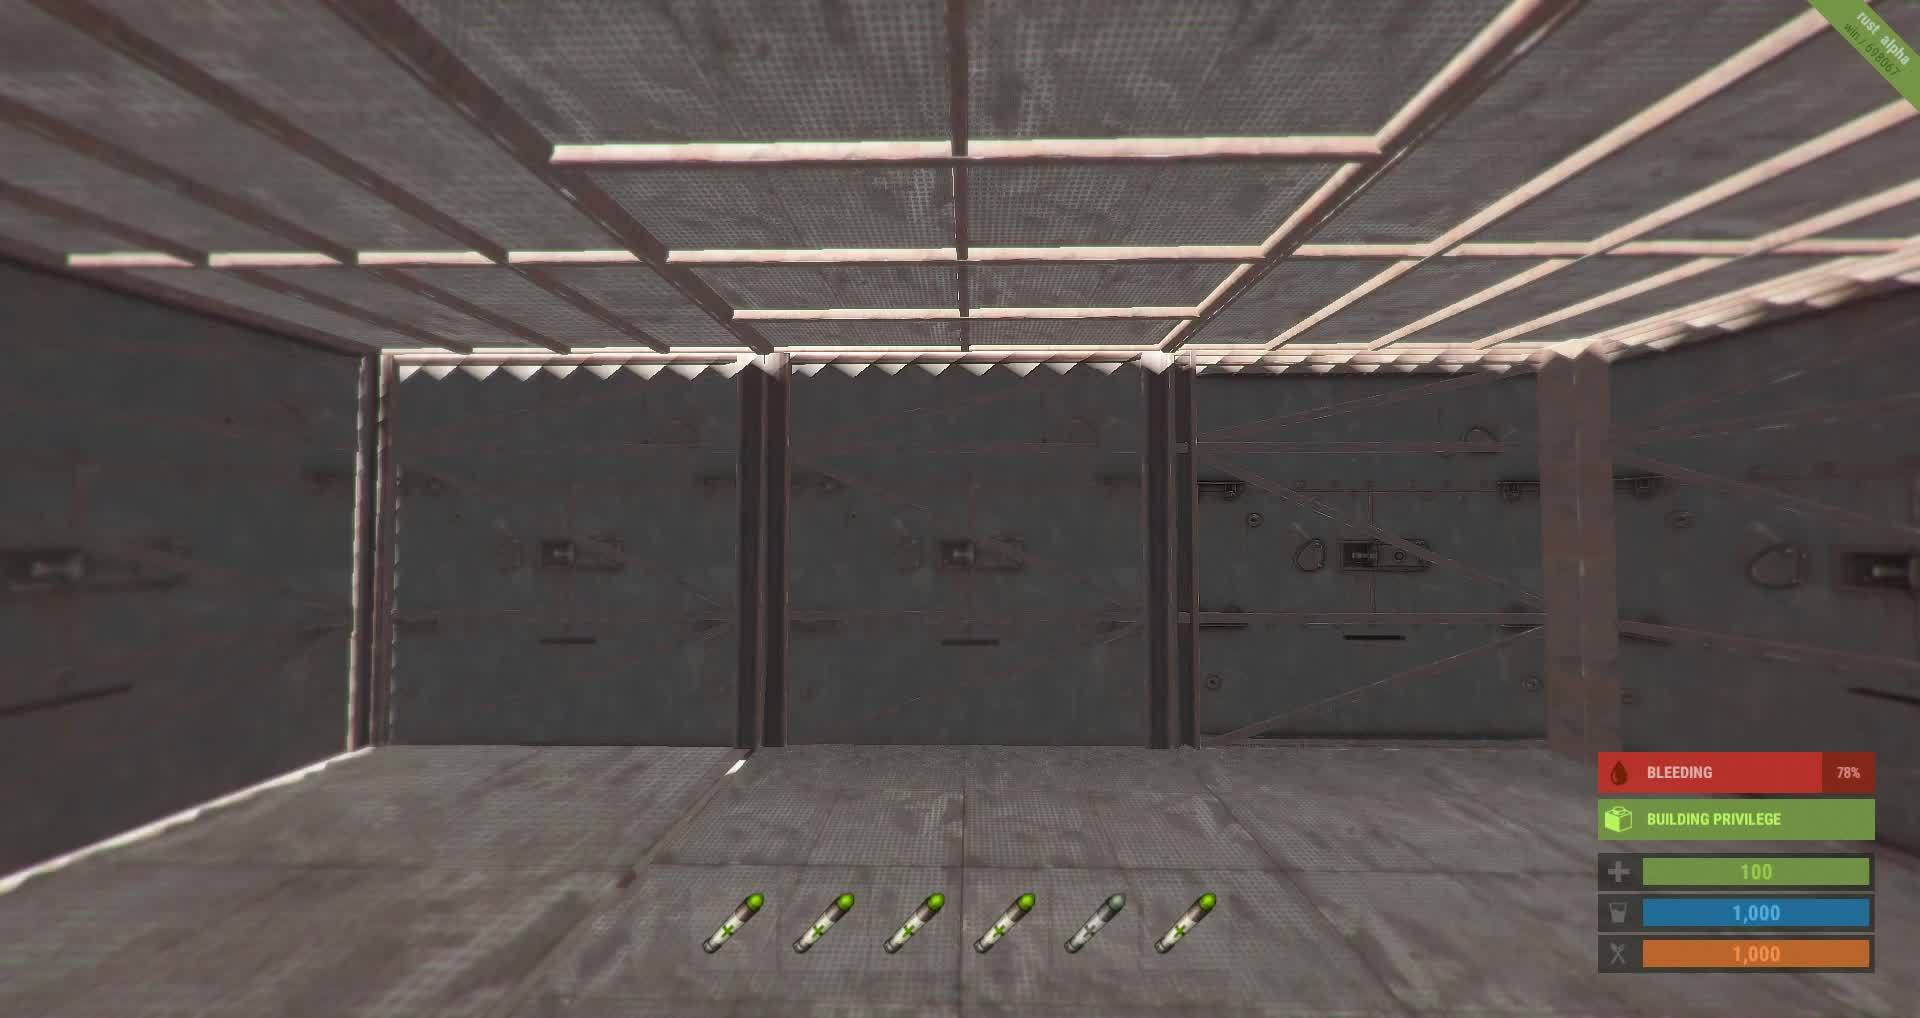 playrust, Revolver GIFs